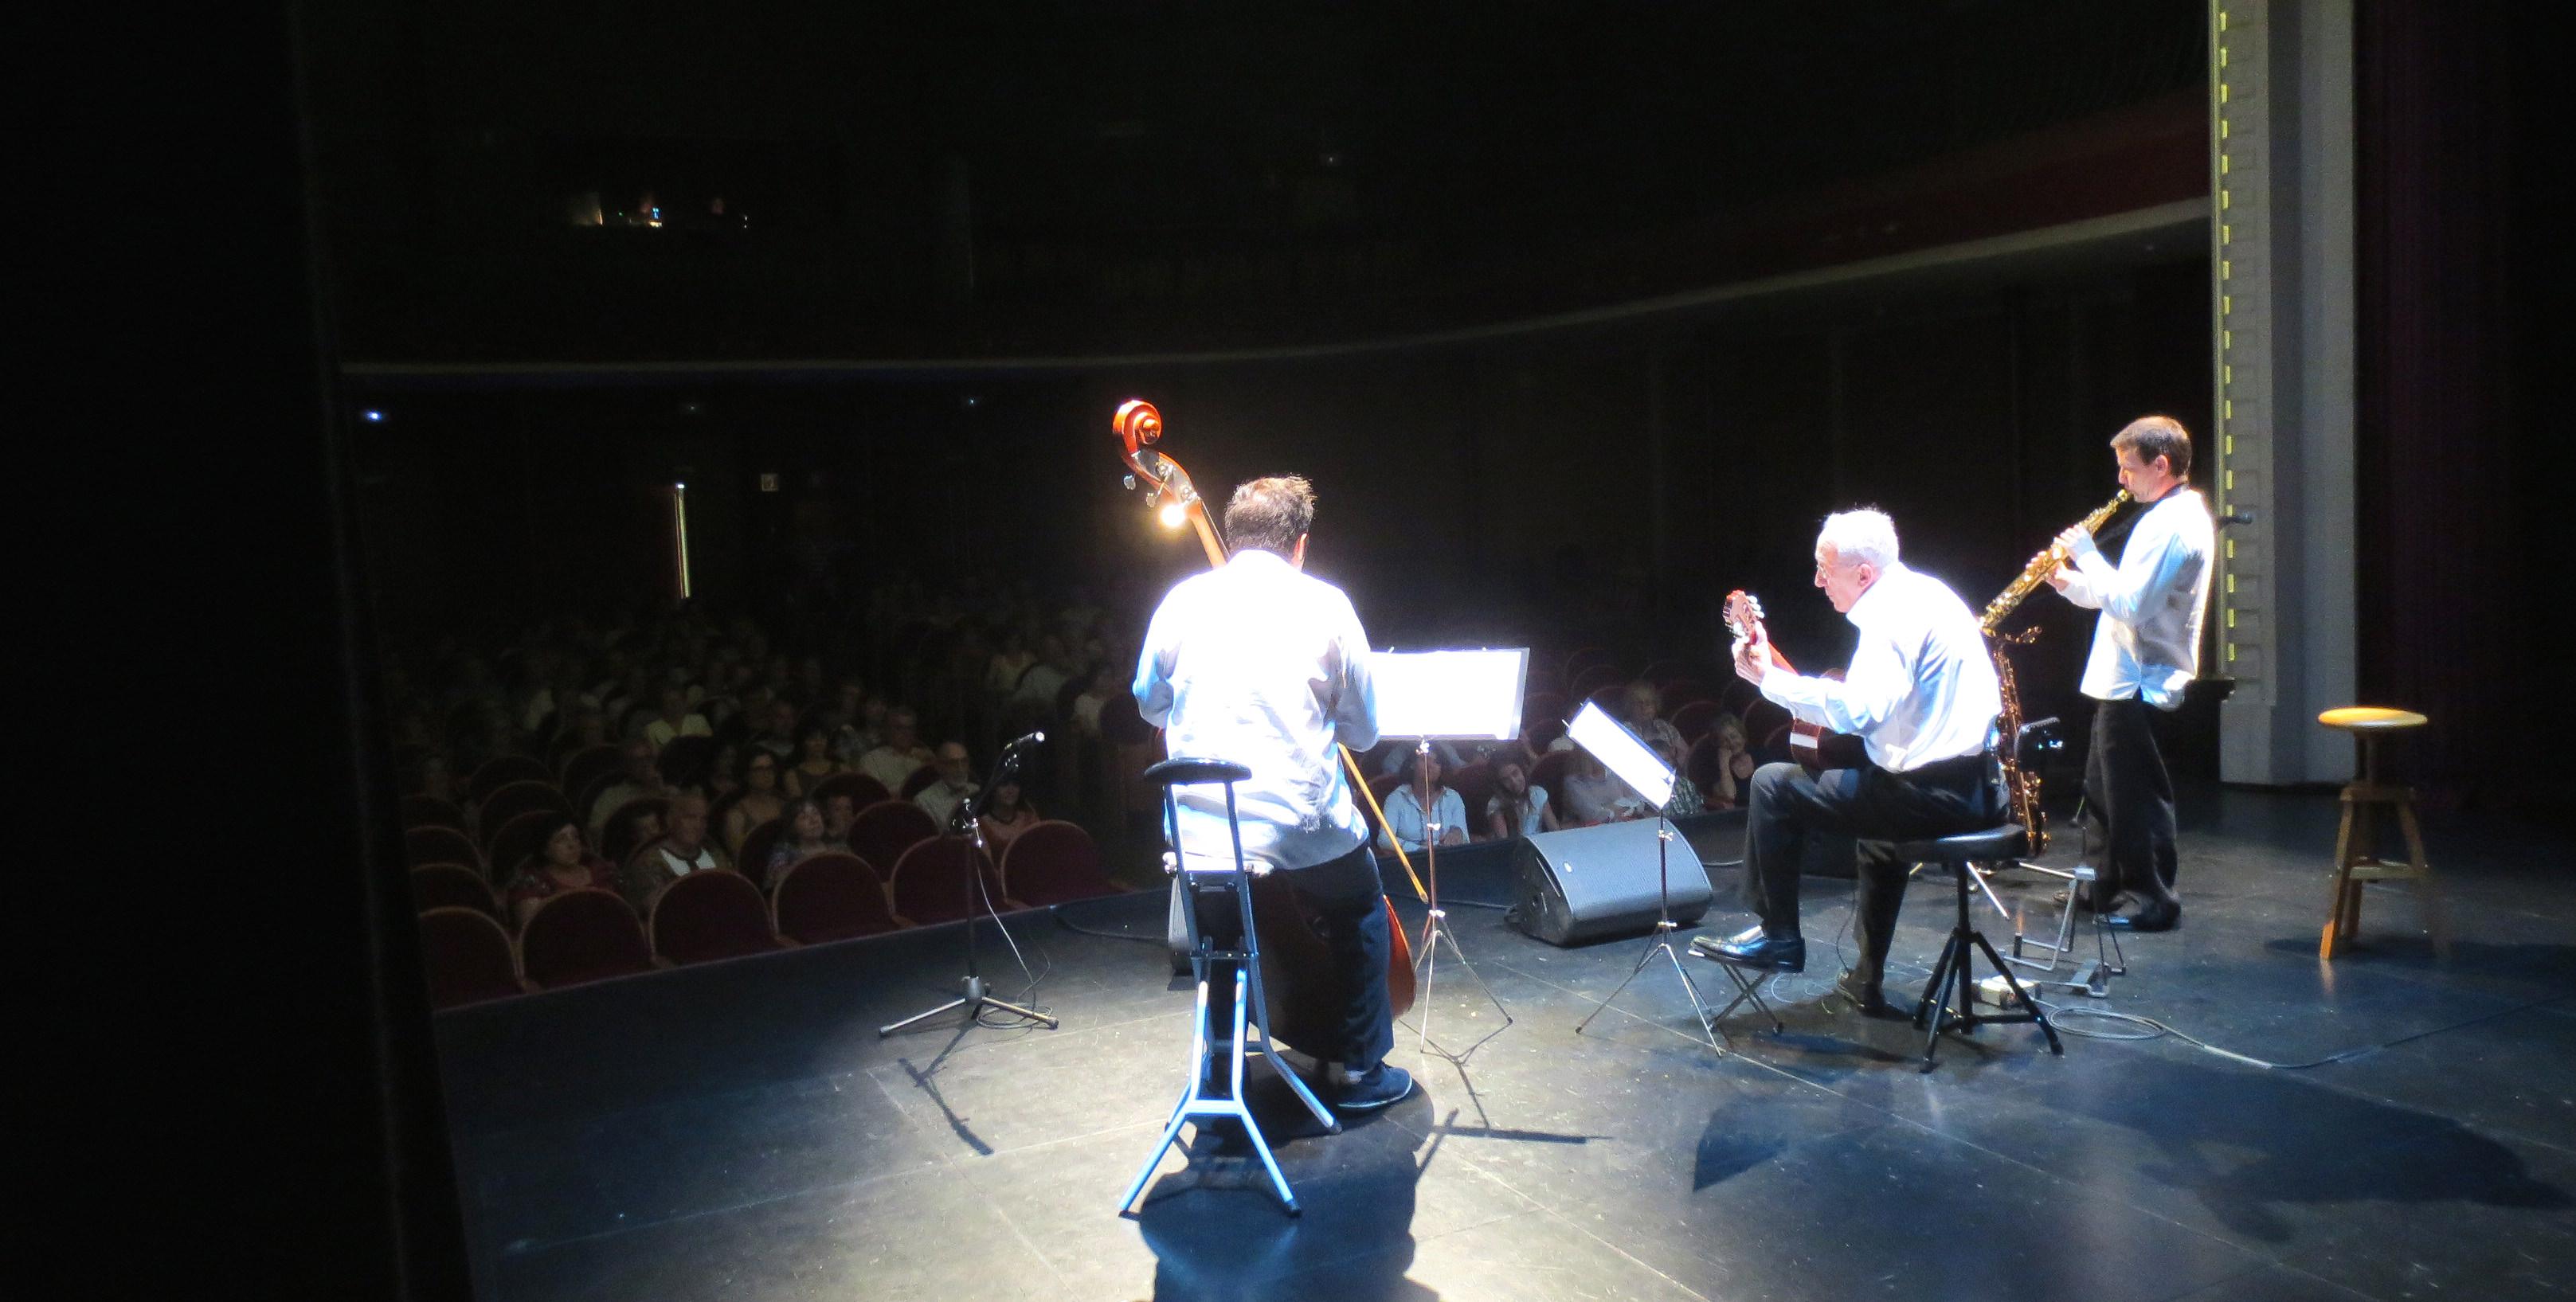 Concert a benefici de l'escola de Bobok